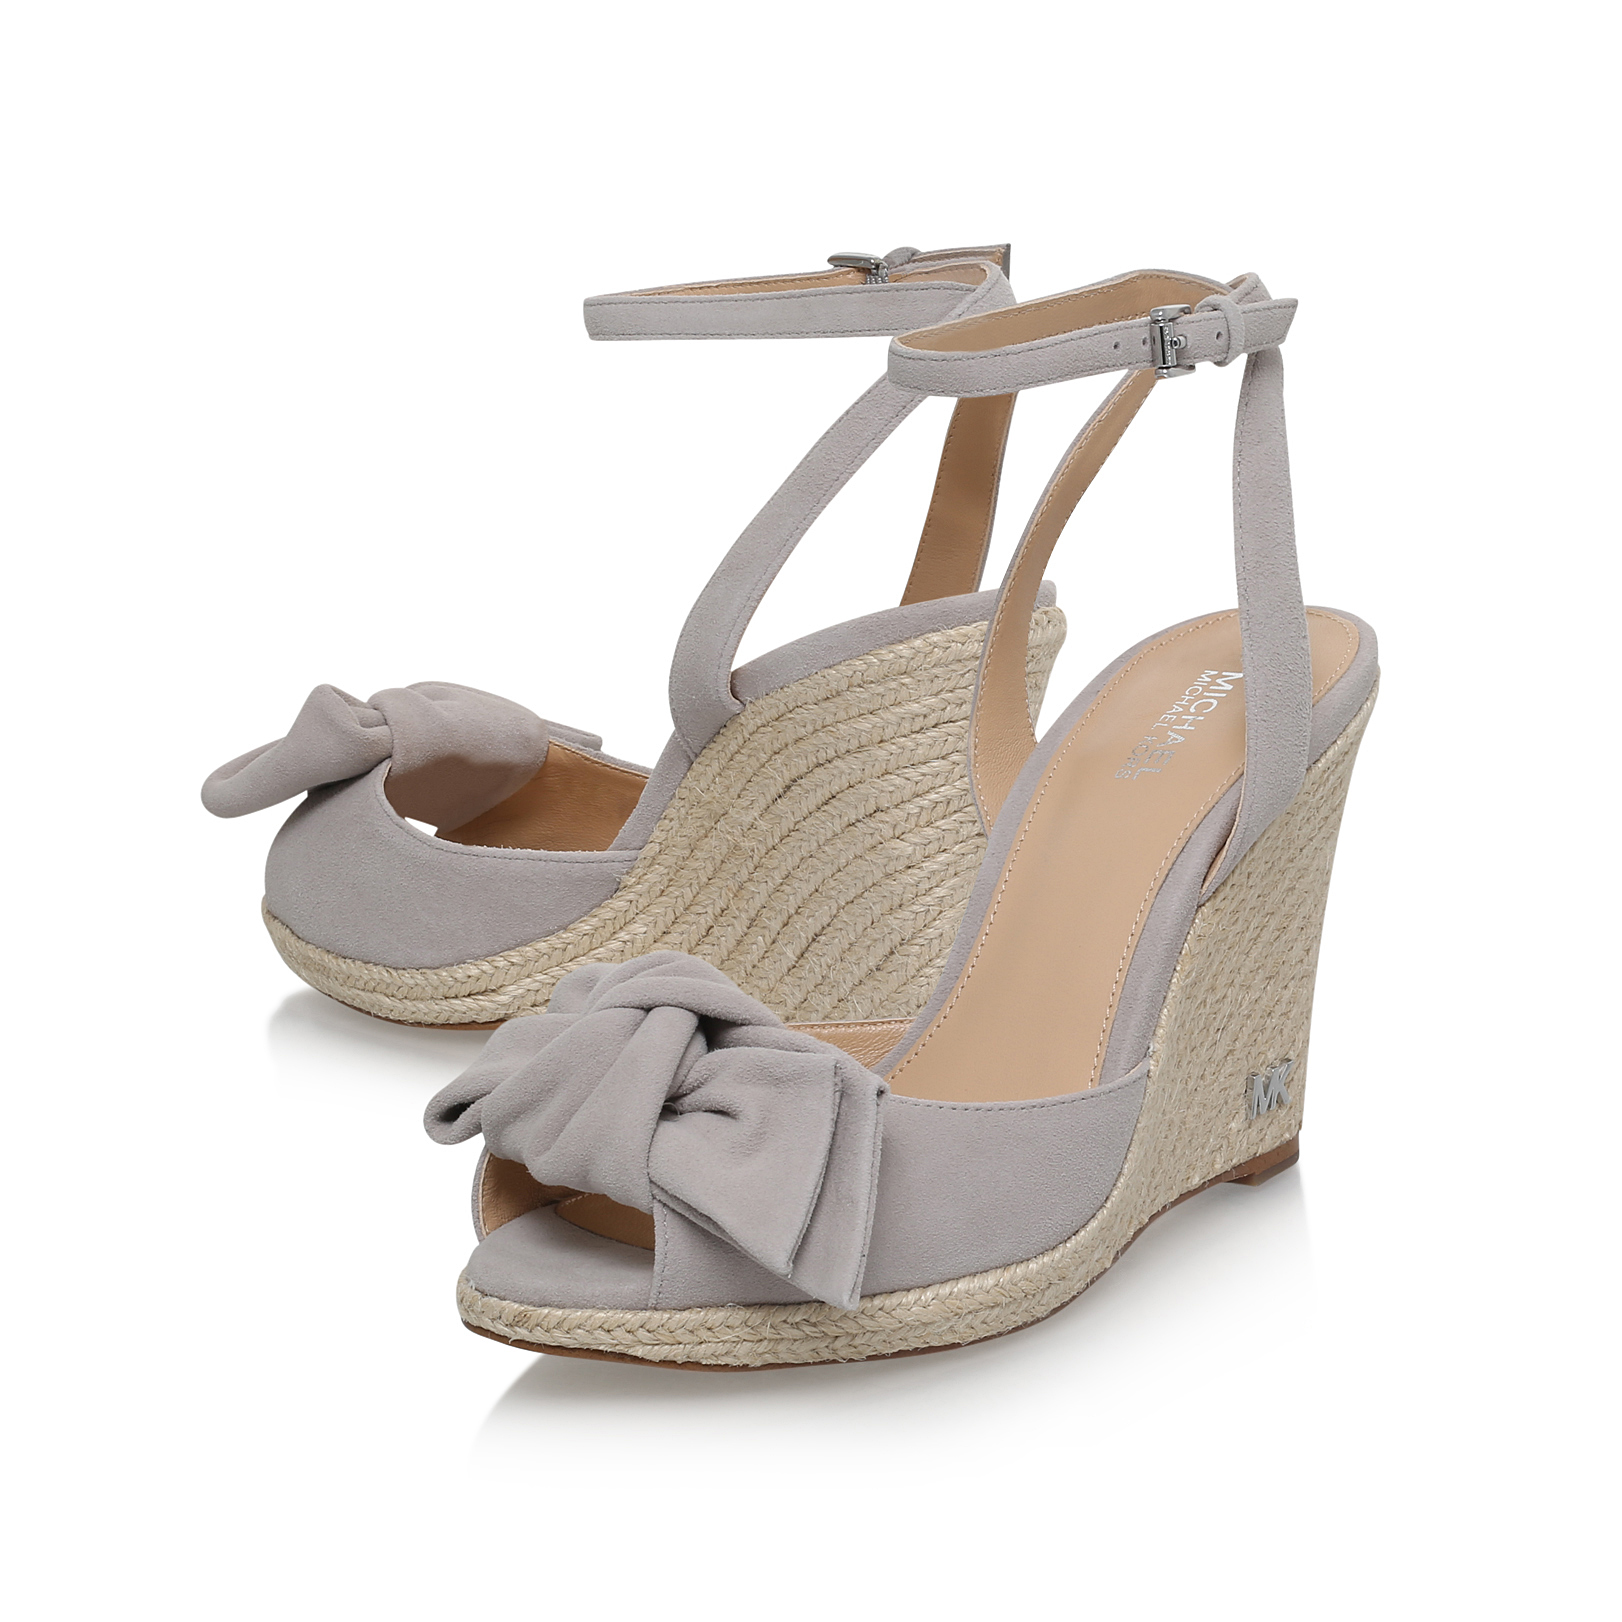 c78c39ab5be5 WILLA WEDGE Michael Michael Kors Willa Mid Grey High Heel Sandals by ...